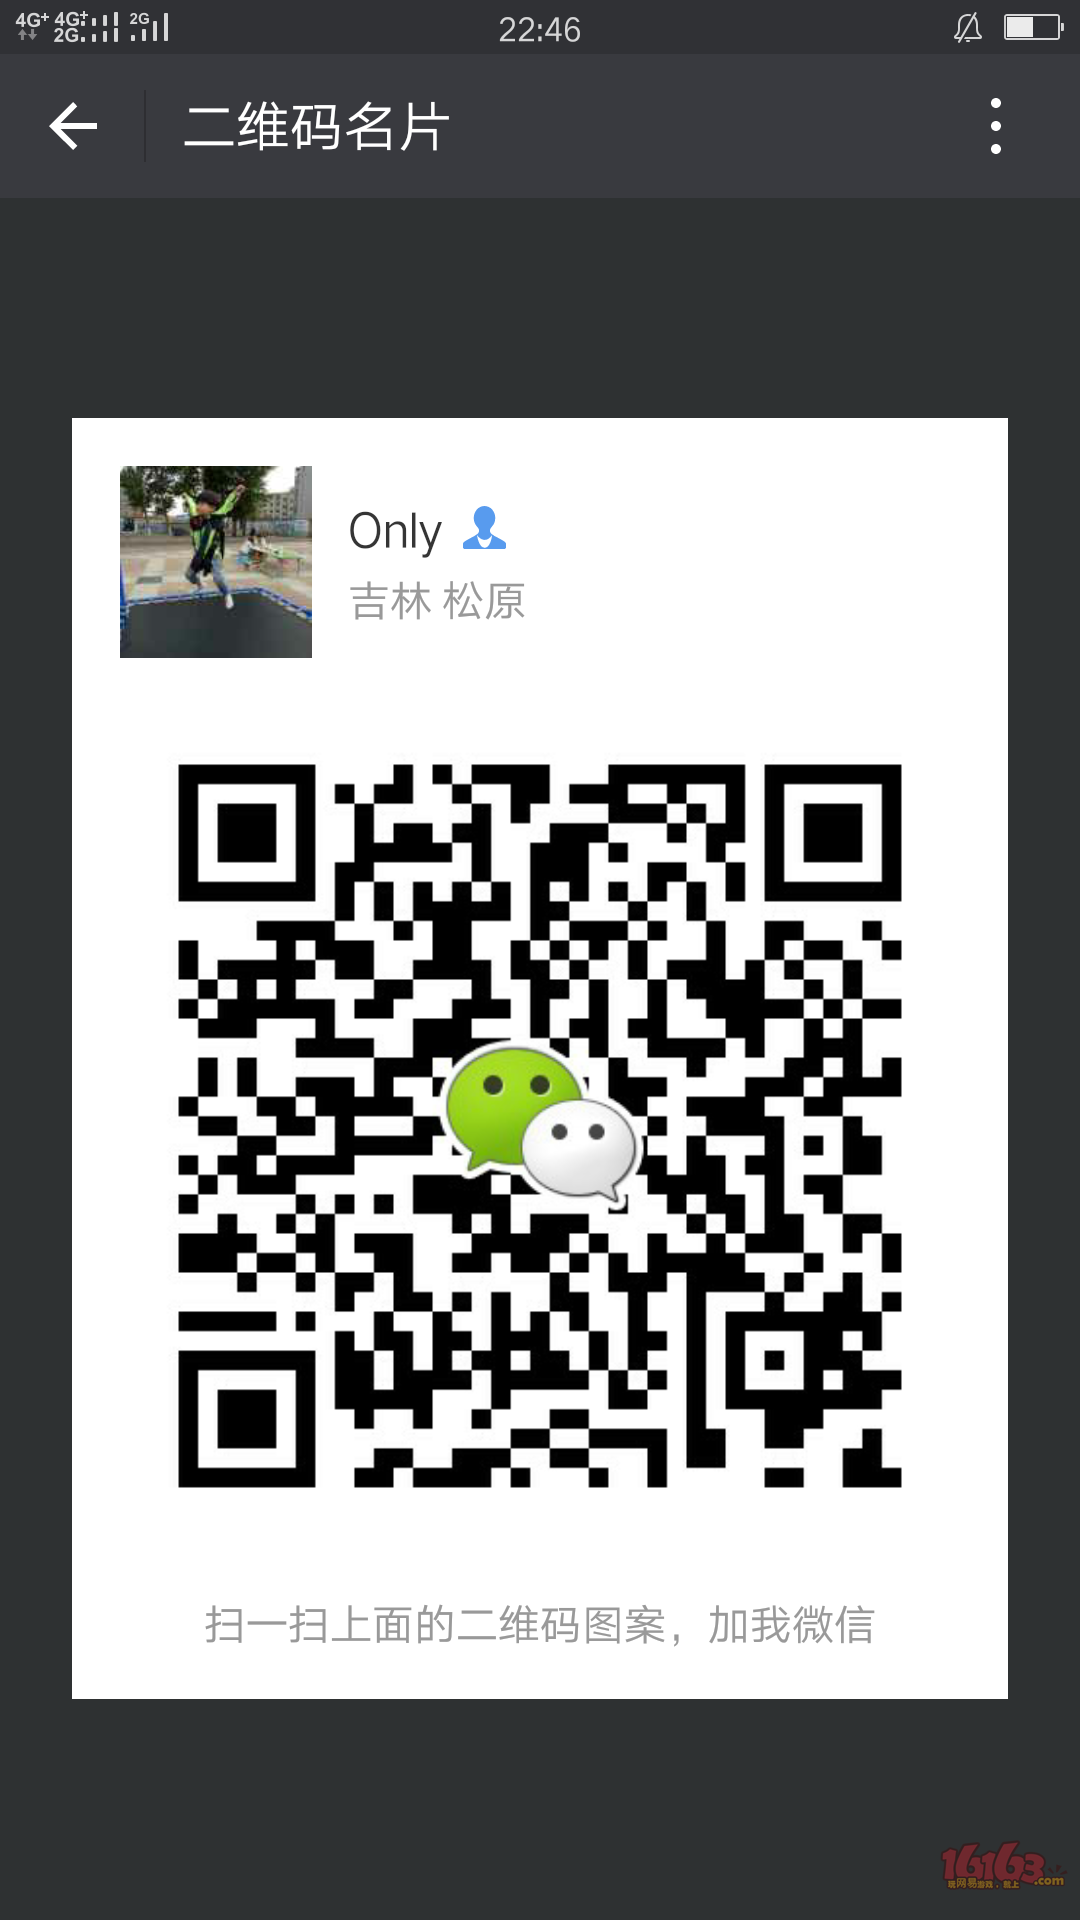 Screenshot_2018-01-01-22-46-54-81.png